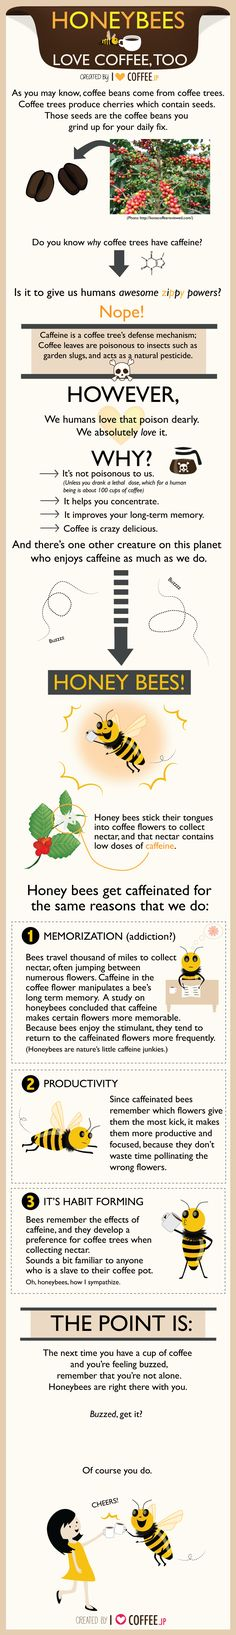 Honeybees are nature's caffeine addicts!